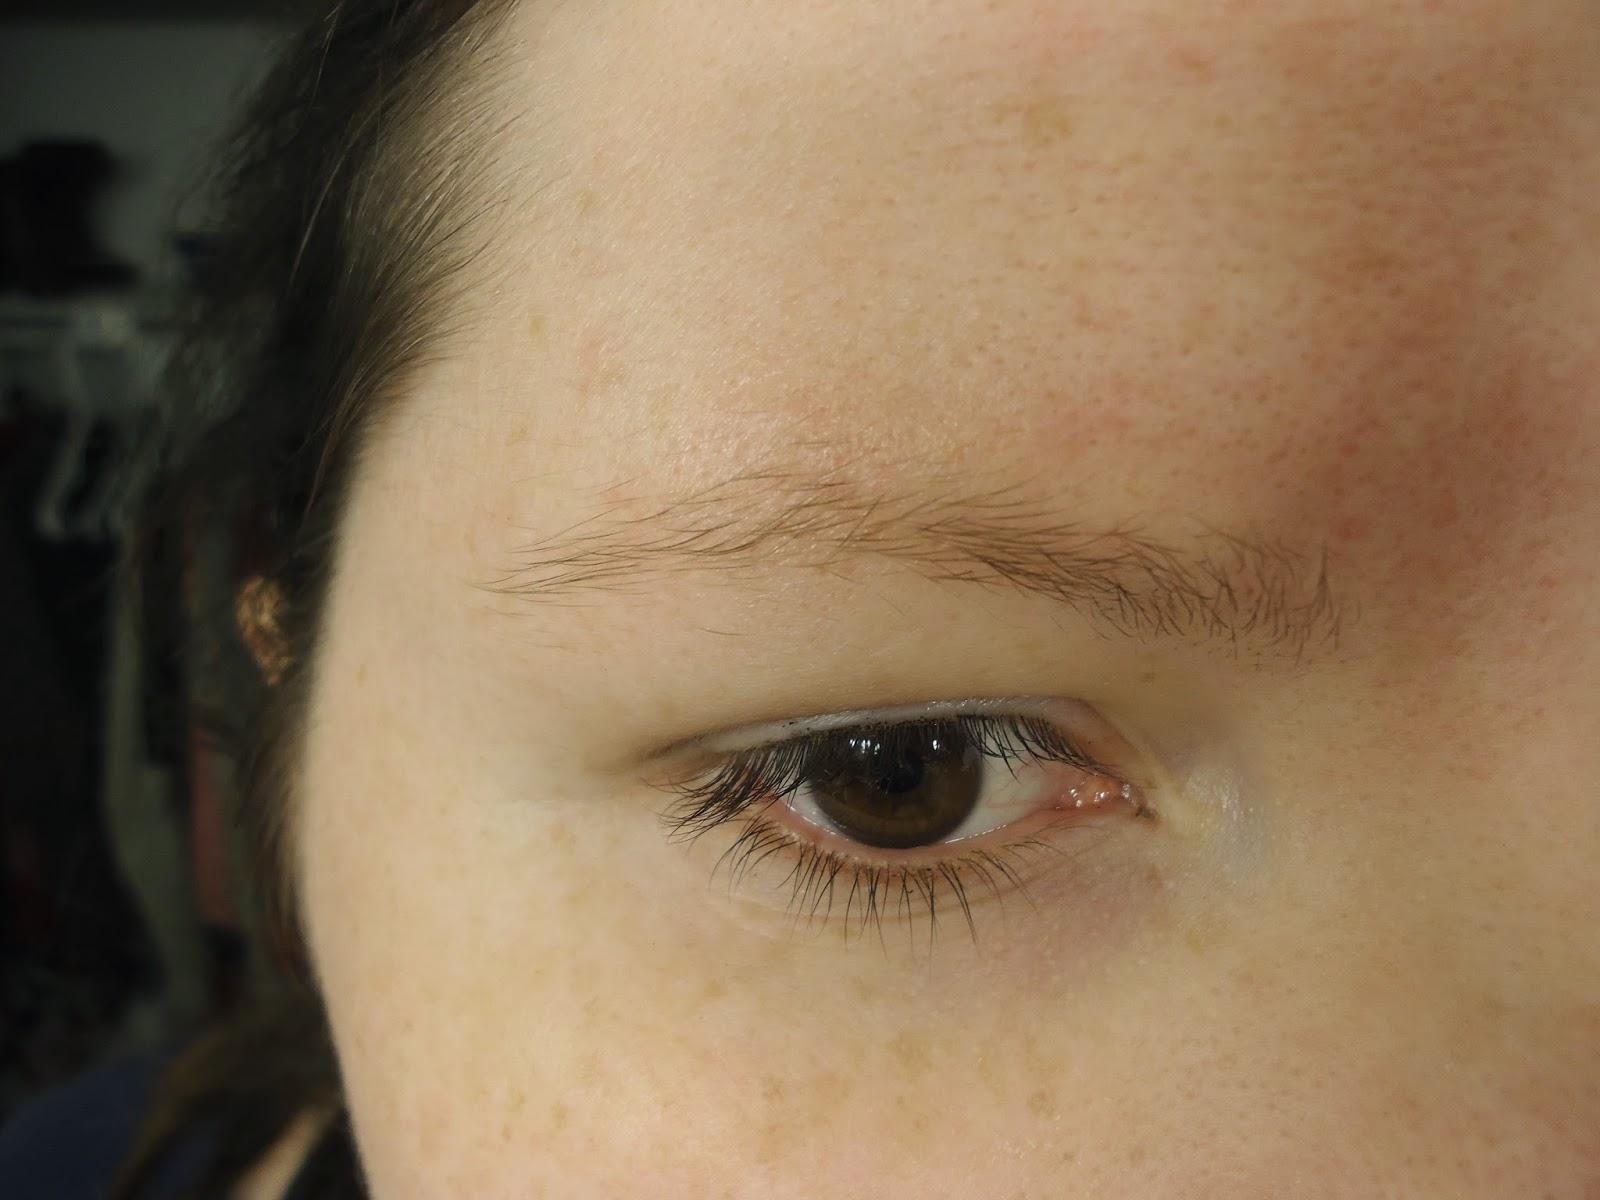 Harga Dan Spek Nyx Tinted Brow Mascara Terbaru 2018 Jaket Motor Pria Rc661 Chocolate Review The Eyebrow Pretend Makeup Artist Cosmetics